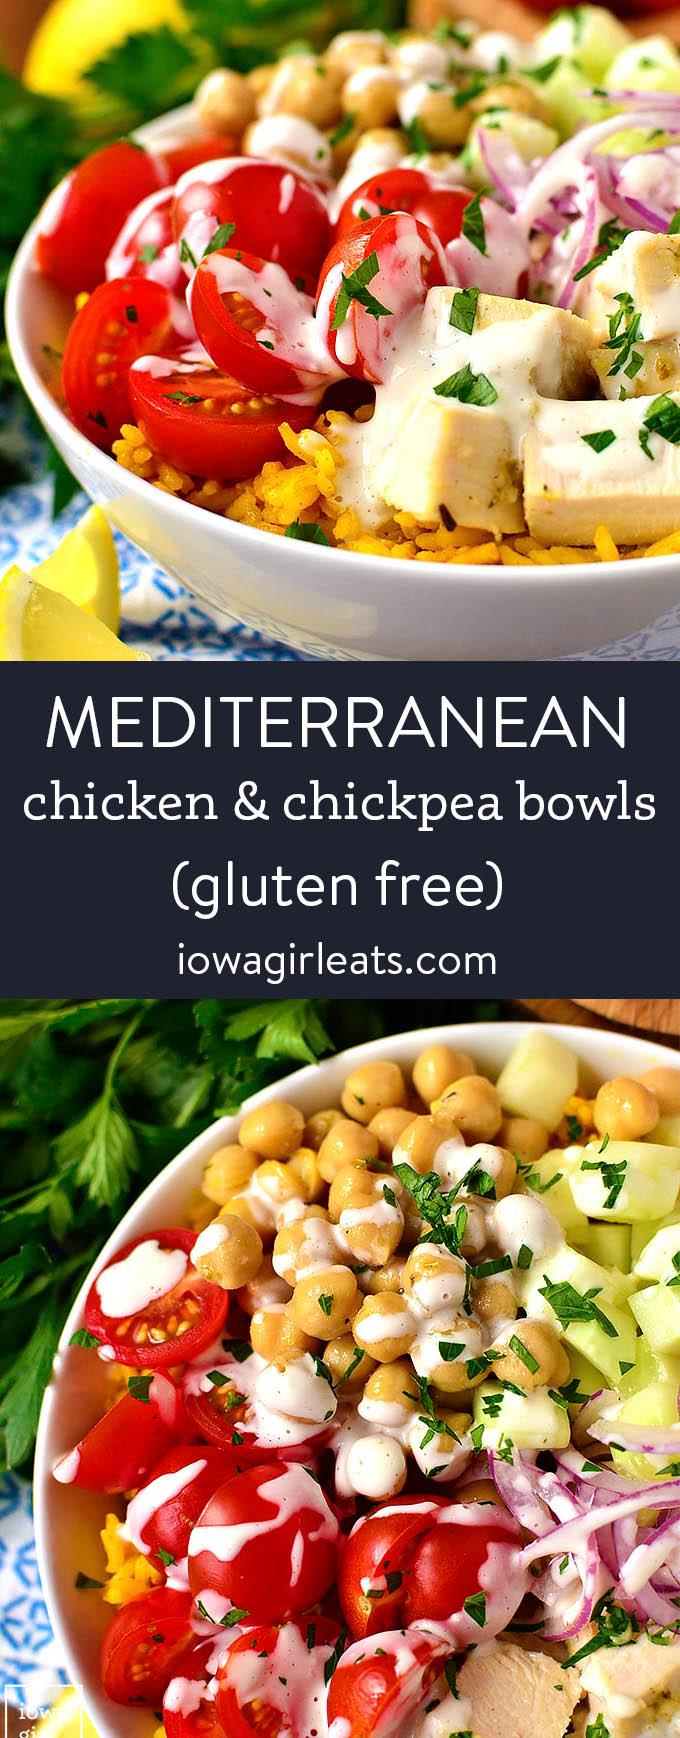 photo collage of mediterranean chicken and chickpea bowls